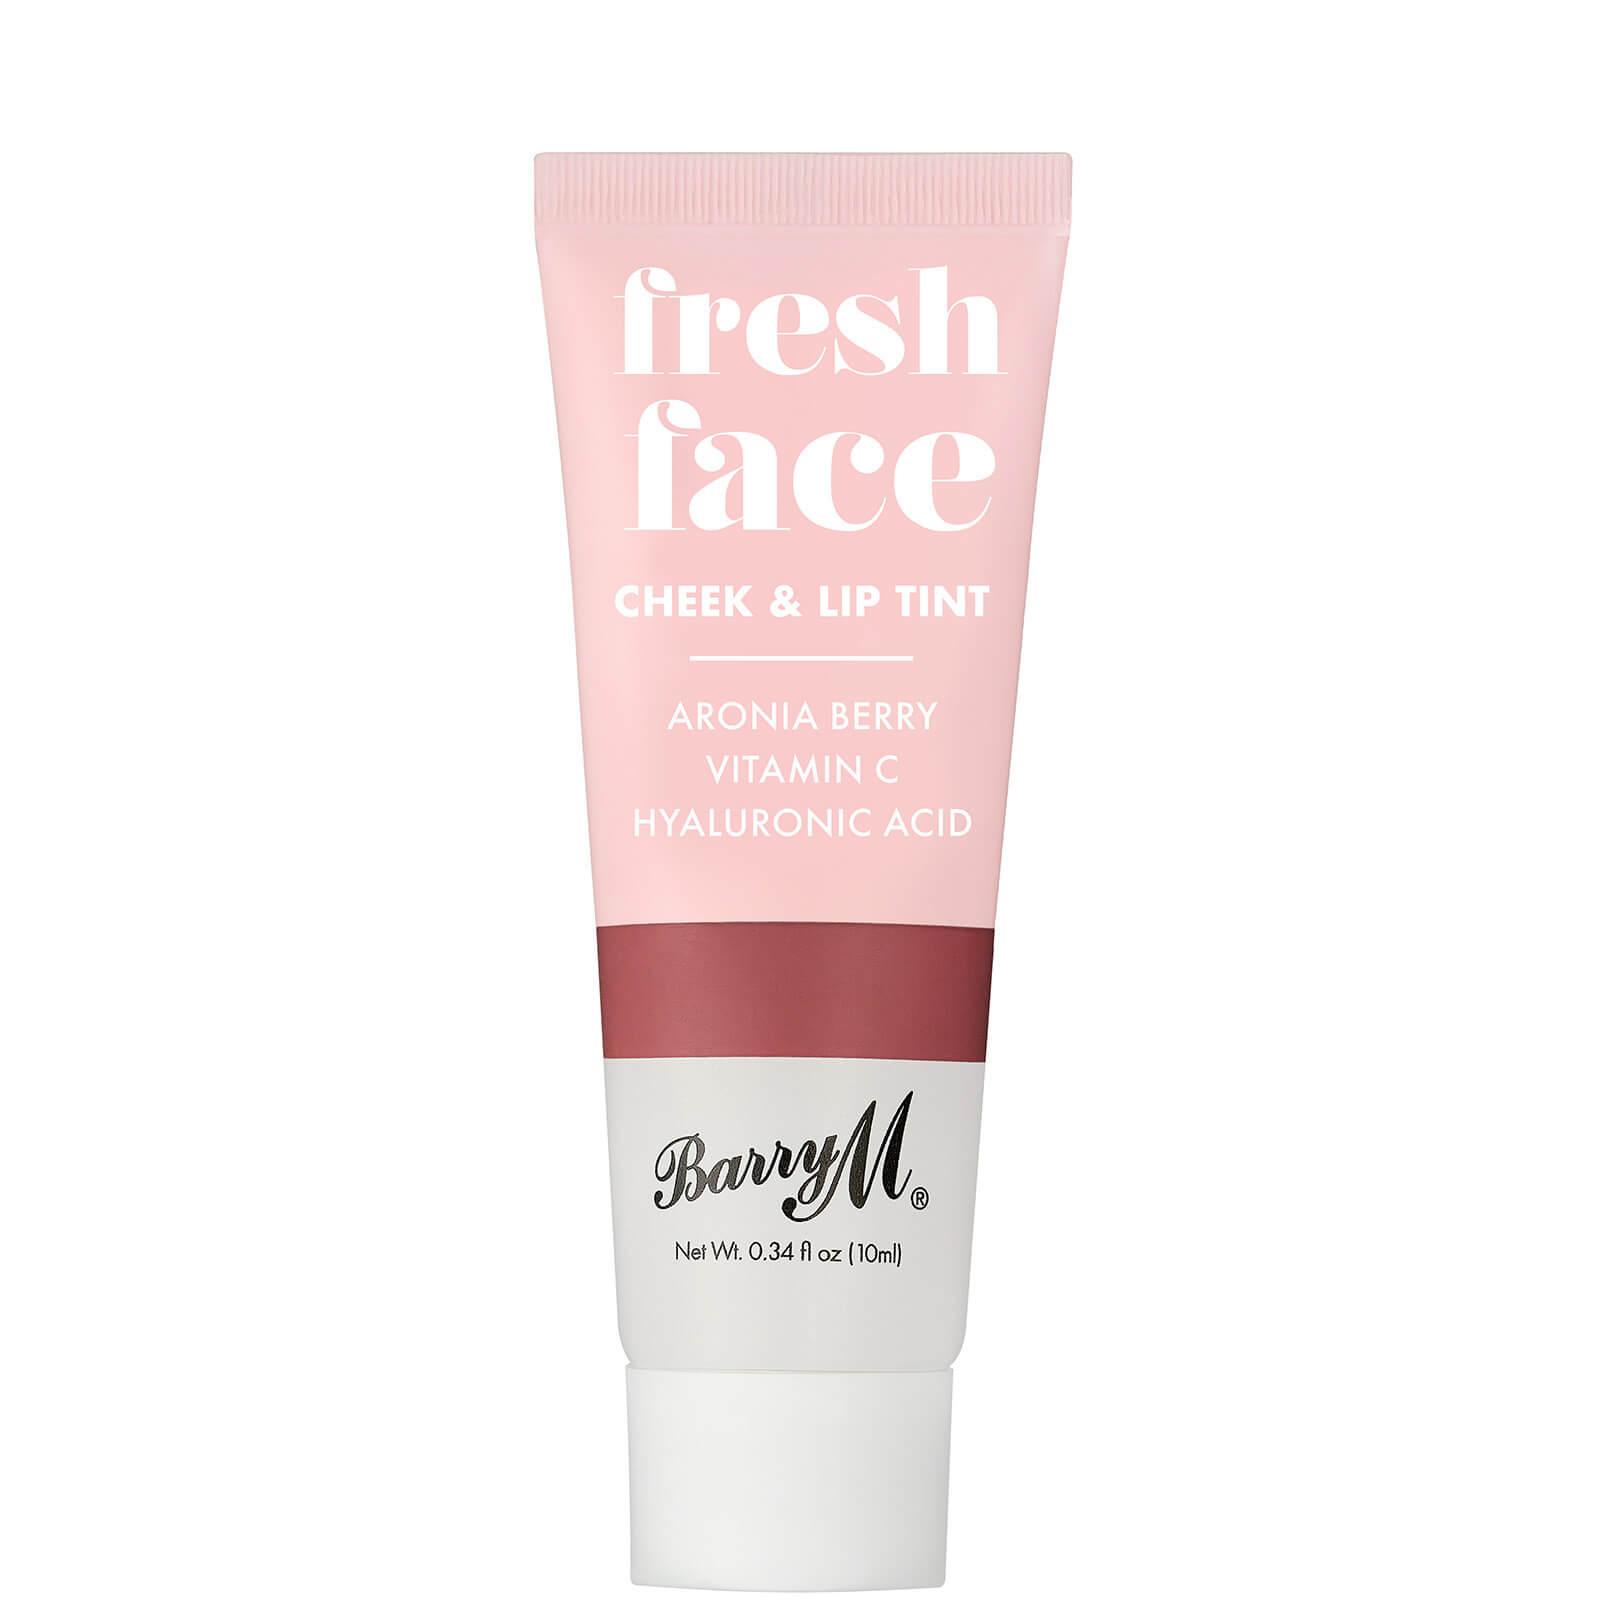 Купить Barry M Cosmetics Fresh Face Cheek and Lip Tint 10ml (Various Shades) - Deep Rose